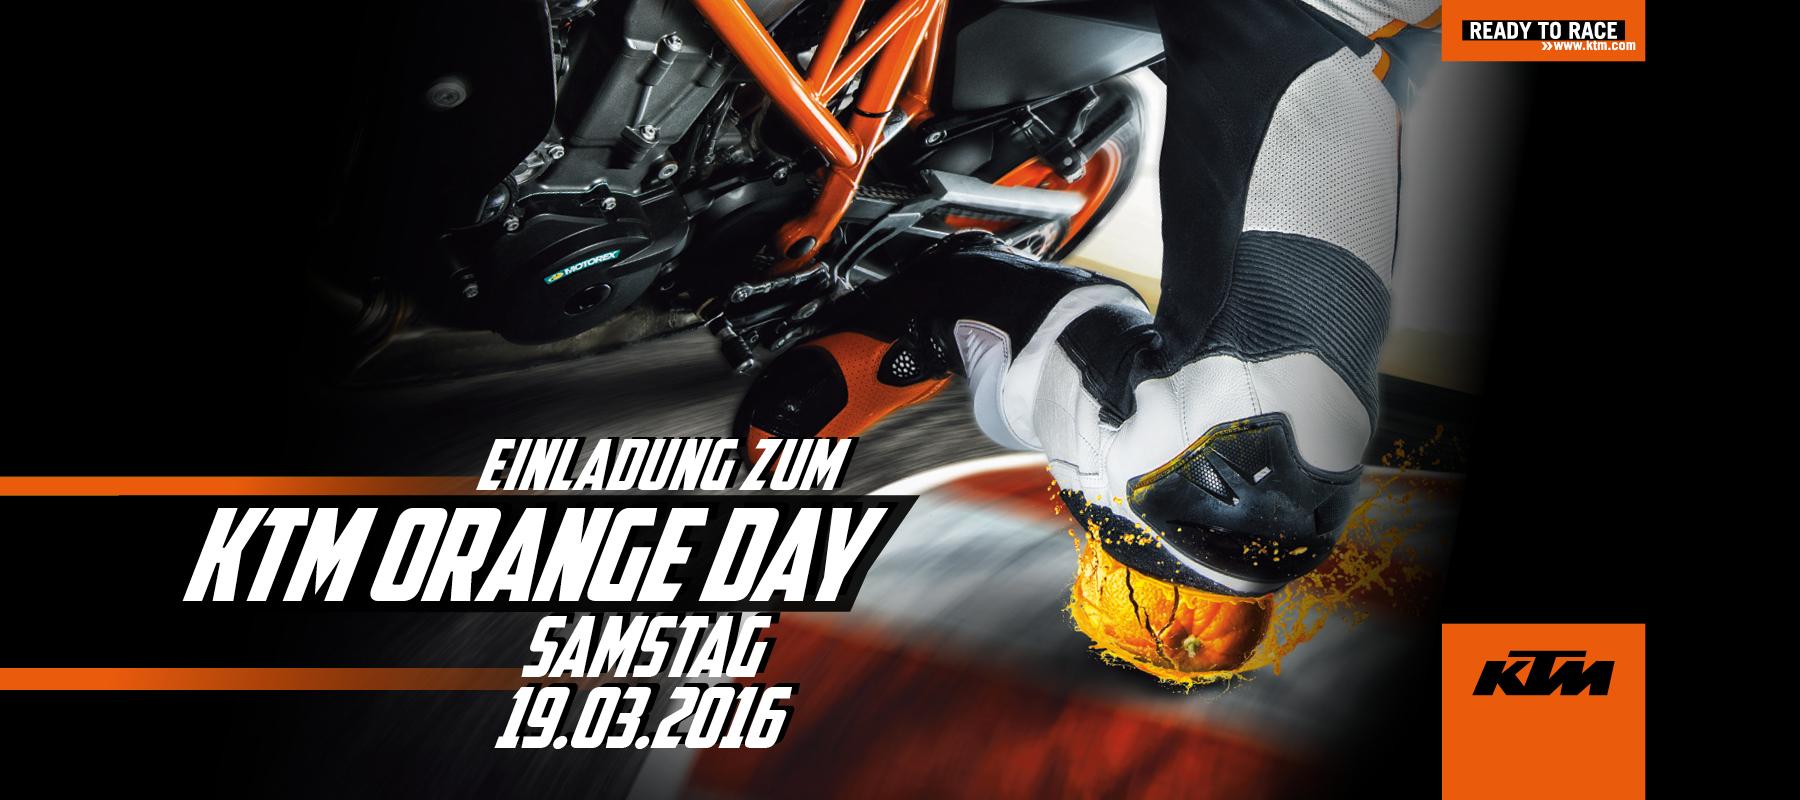 KTM ORANGE DAY 2016